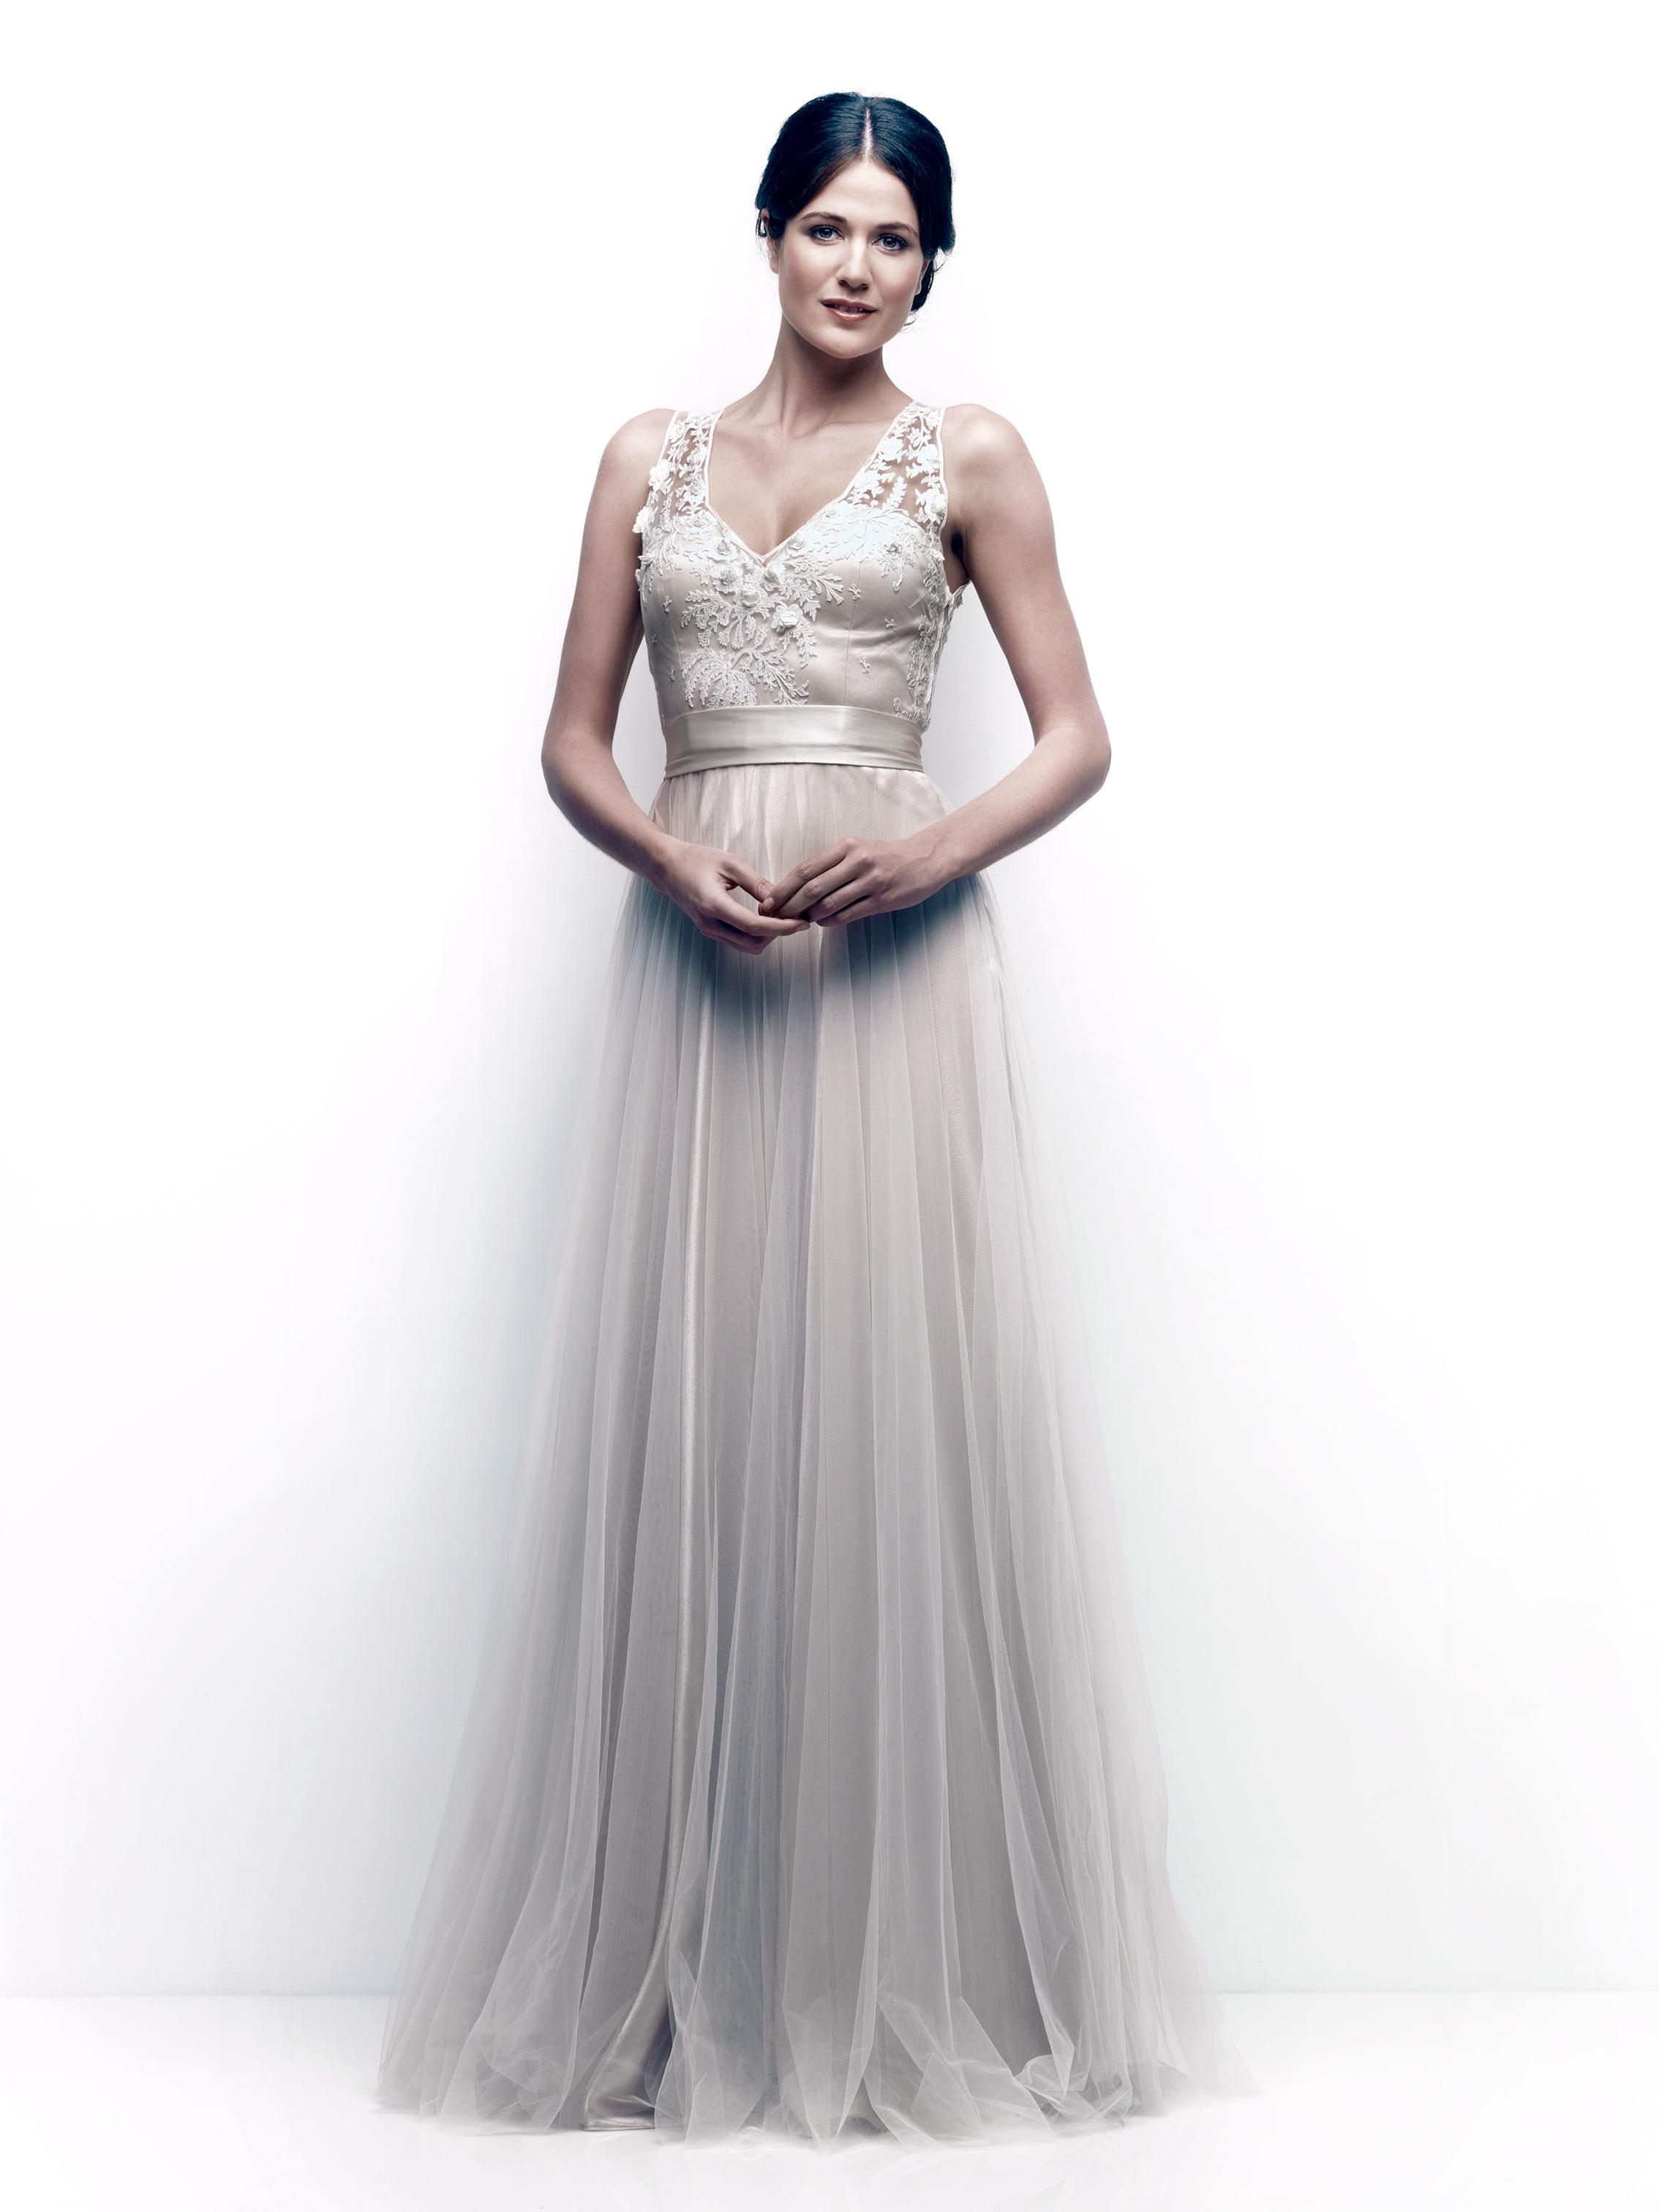 catherine deane wedding dress 2013 bridal onyx onewedcom With catherine deane wedding dress